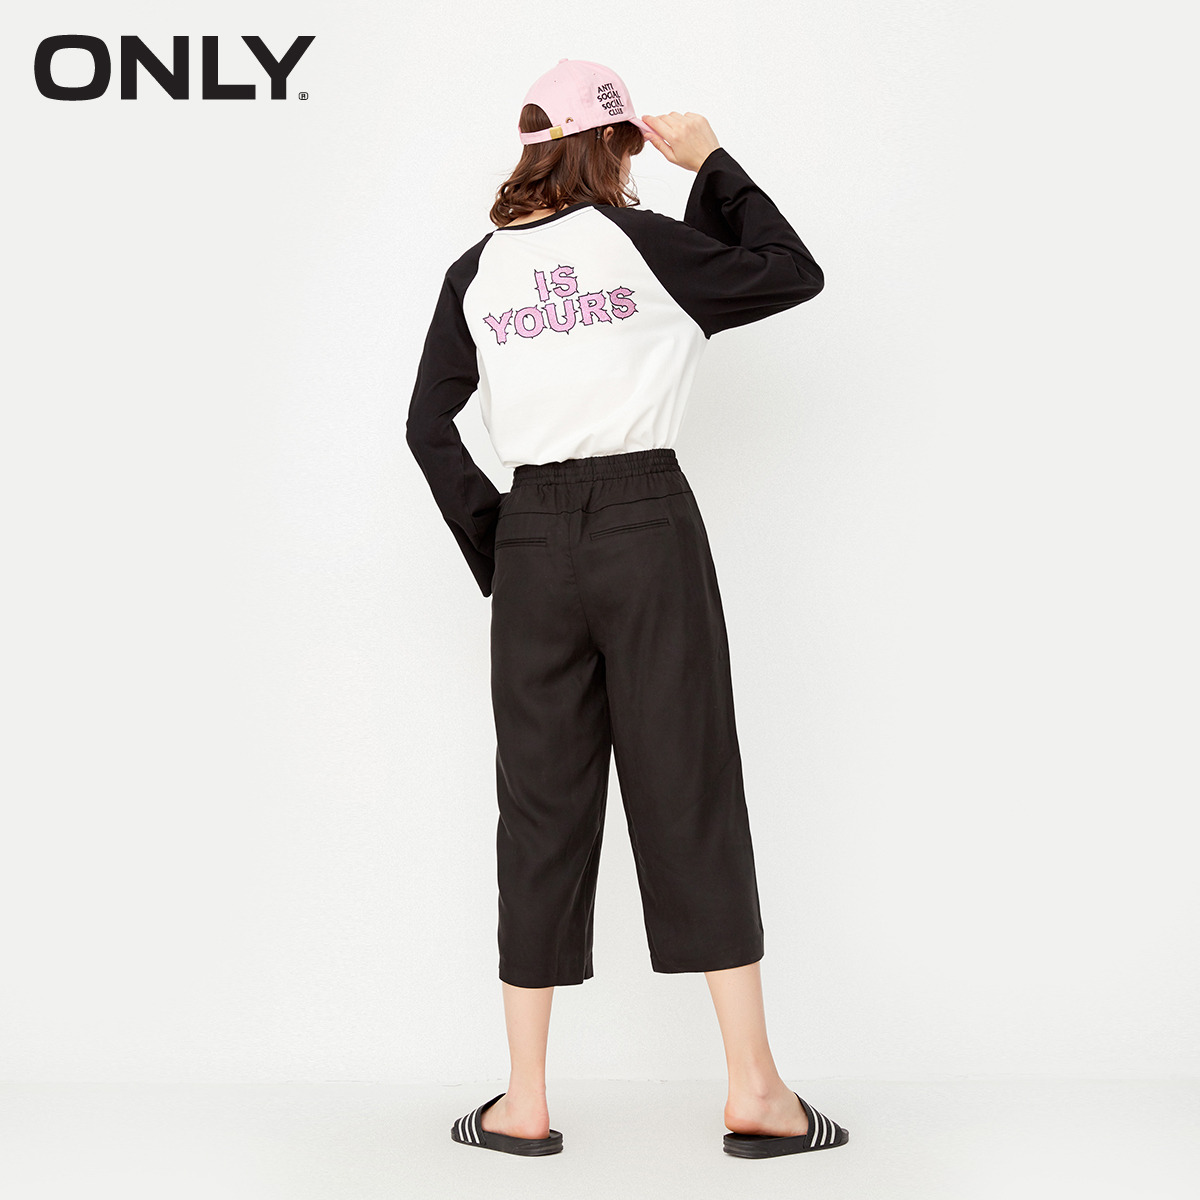 11716J519 天丝松紧腰系带宽松休闲裤女装 ONLY